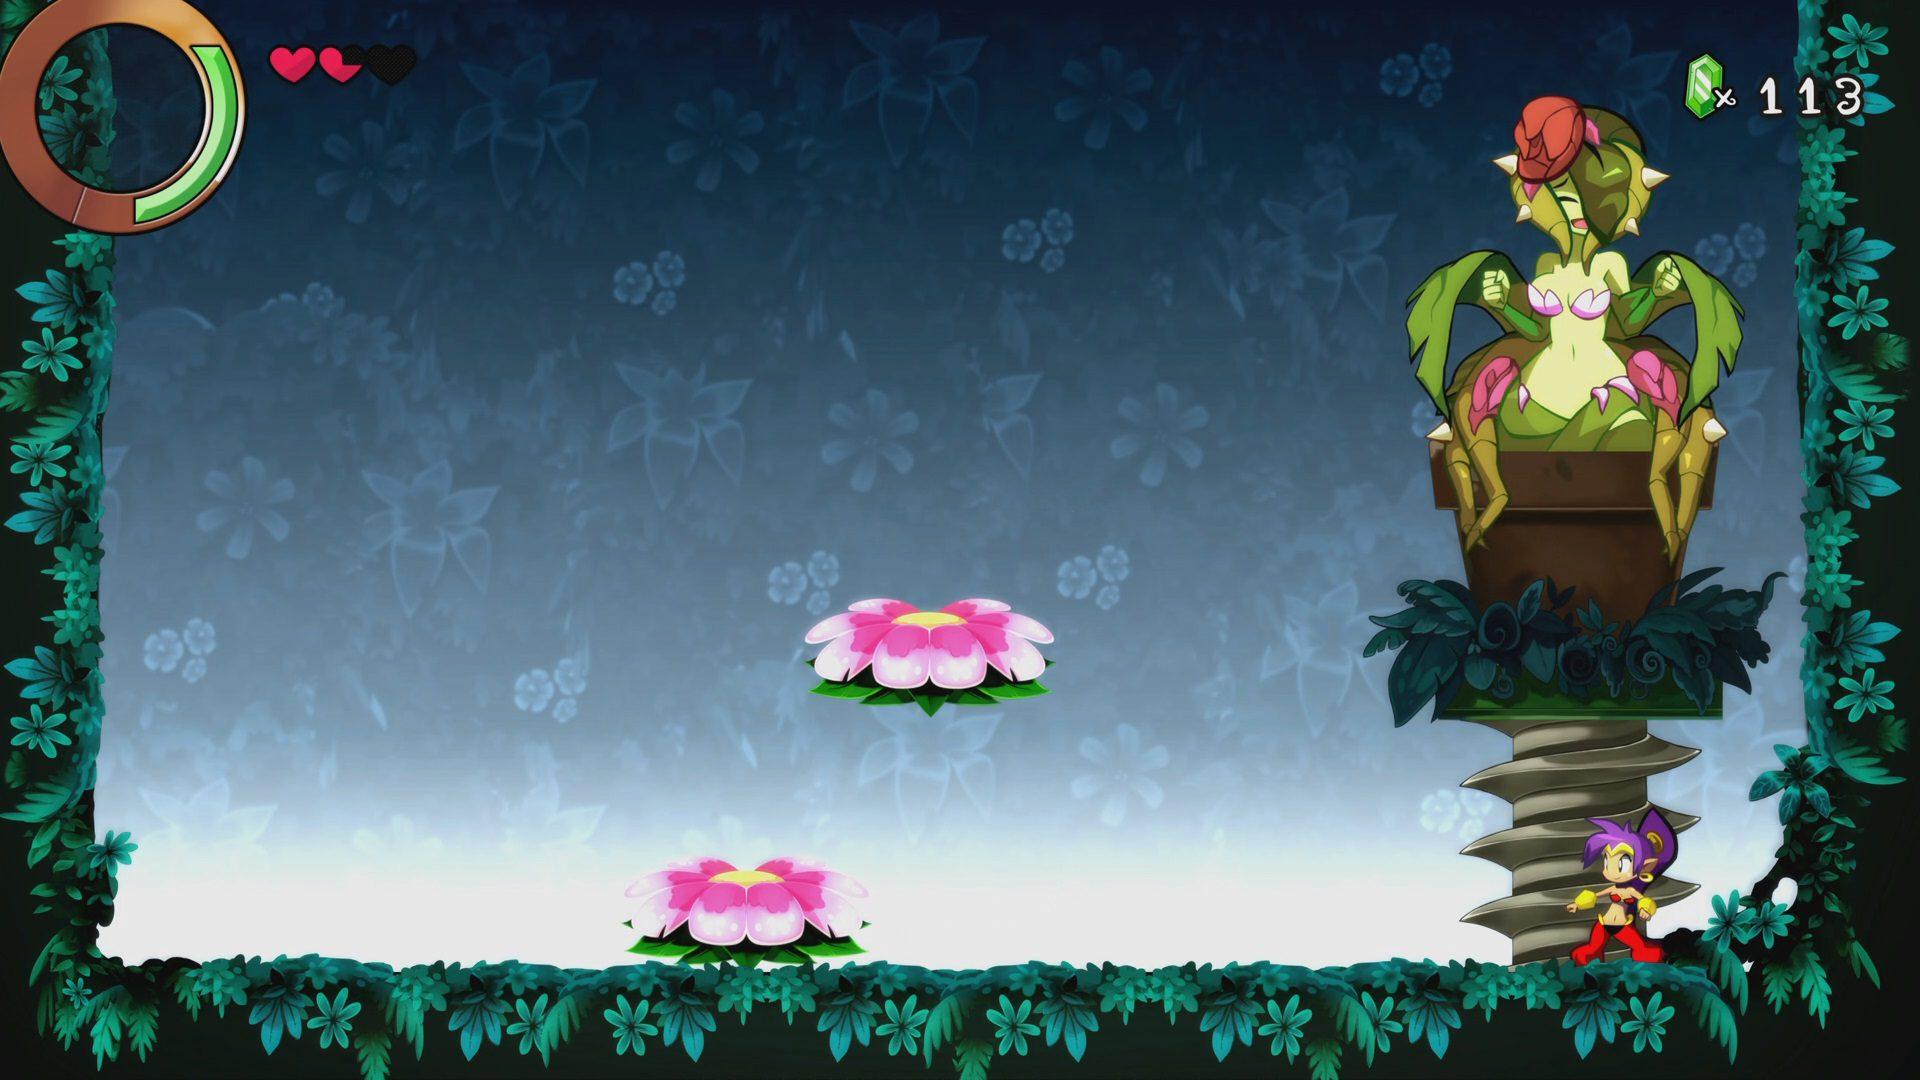 Pelea contra un boss en Shantae and the Seven Sirens